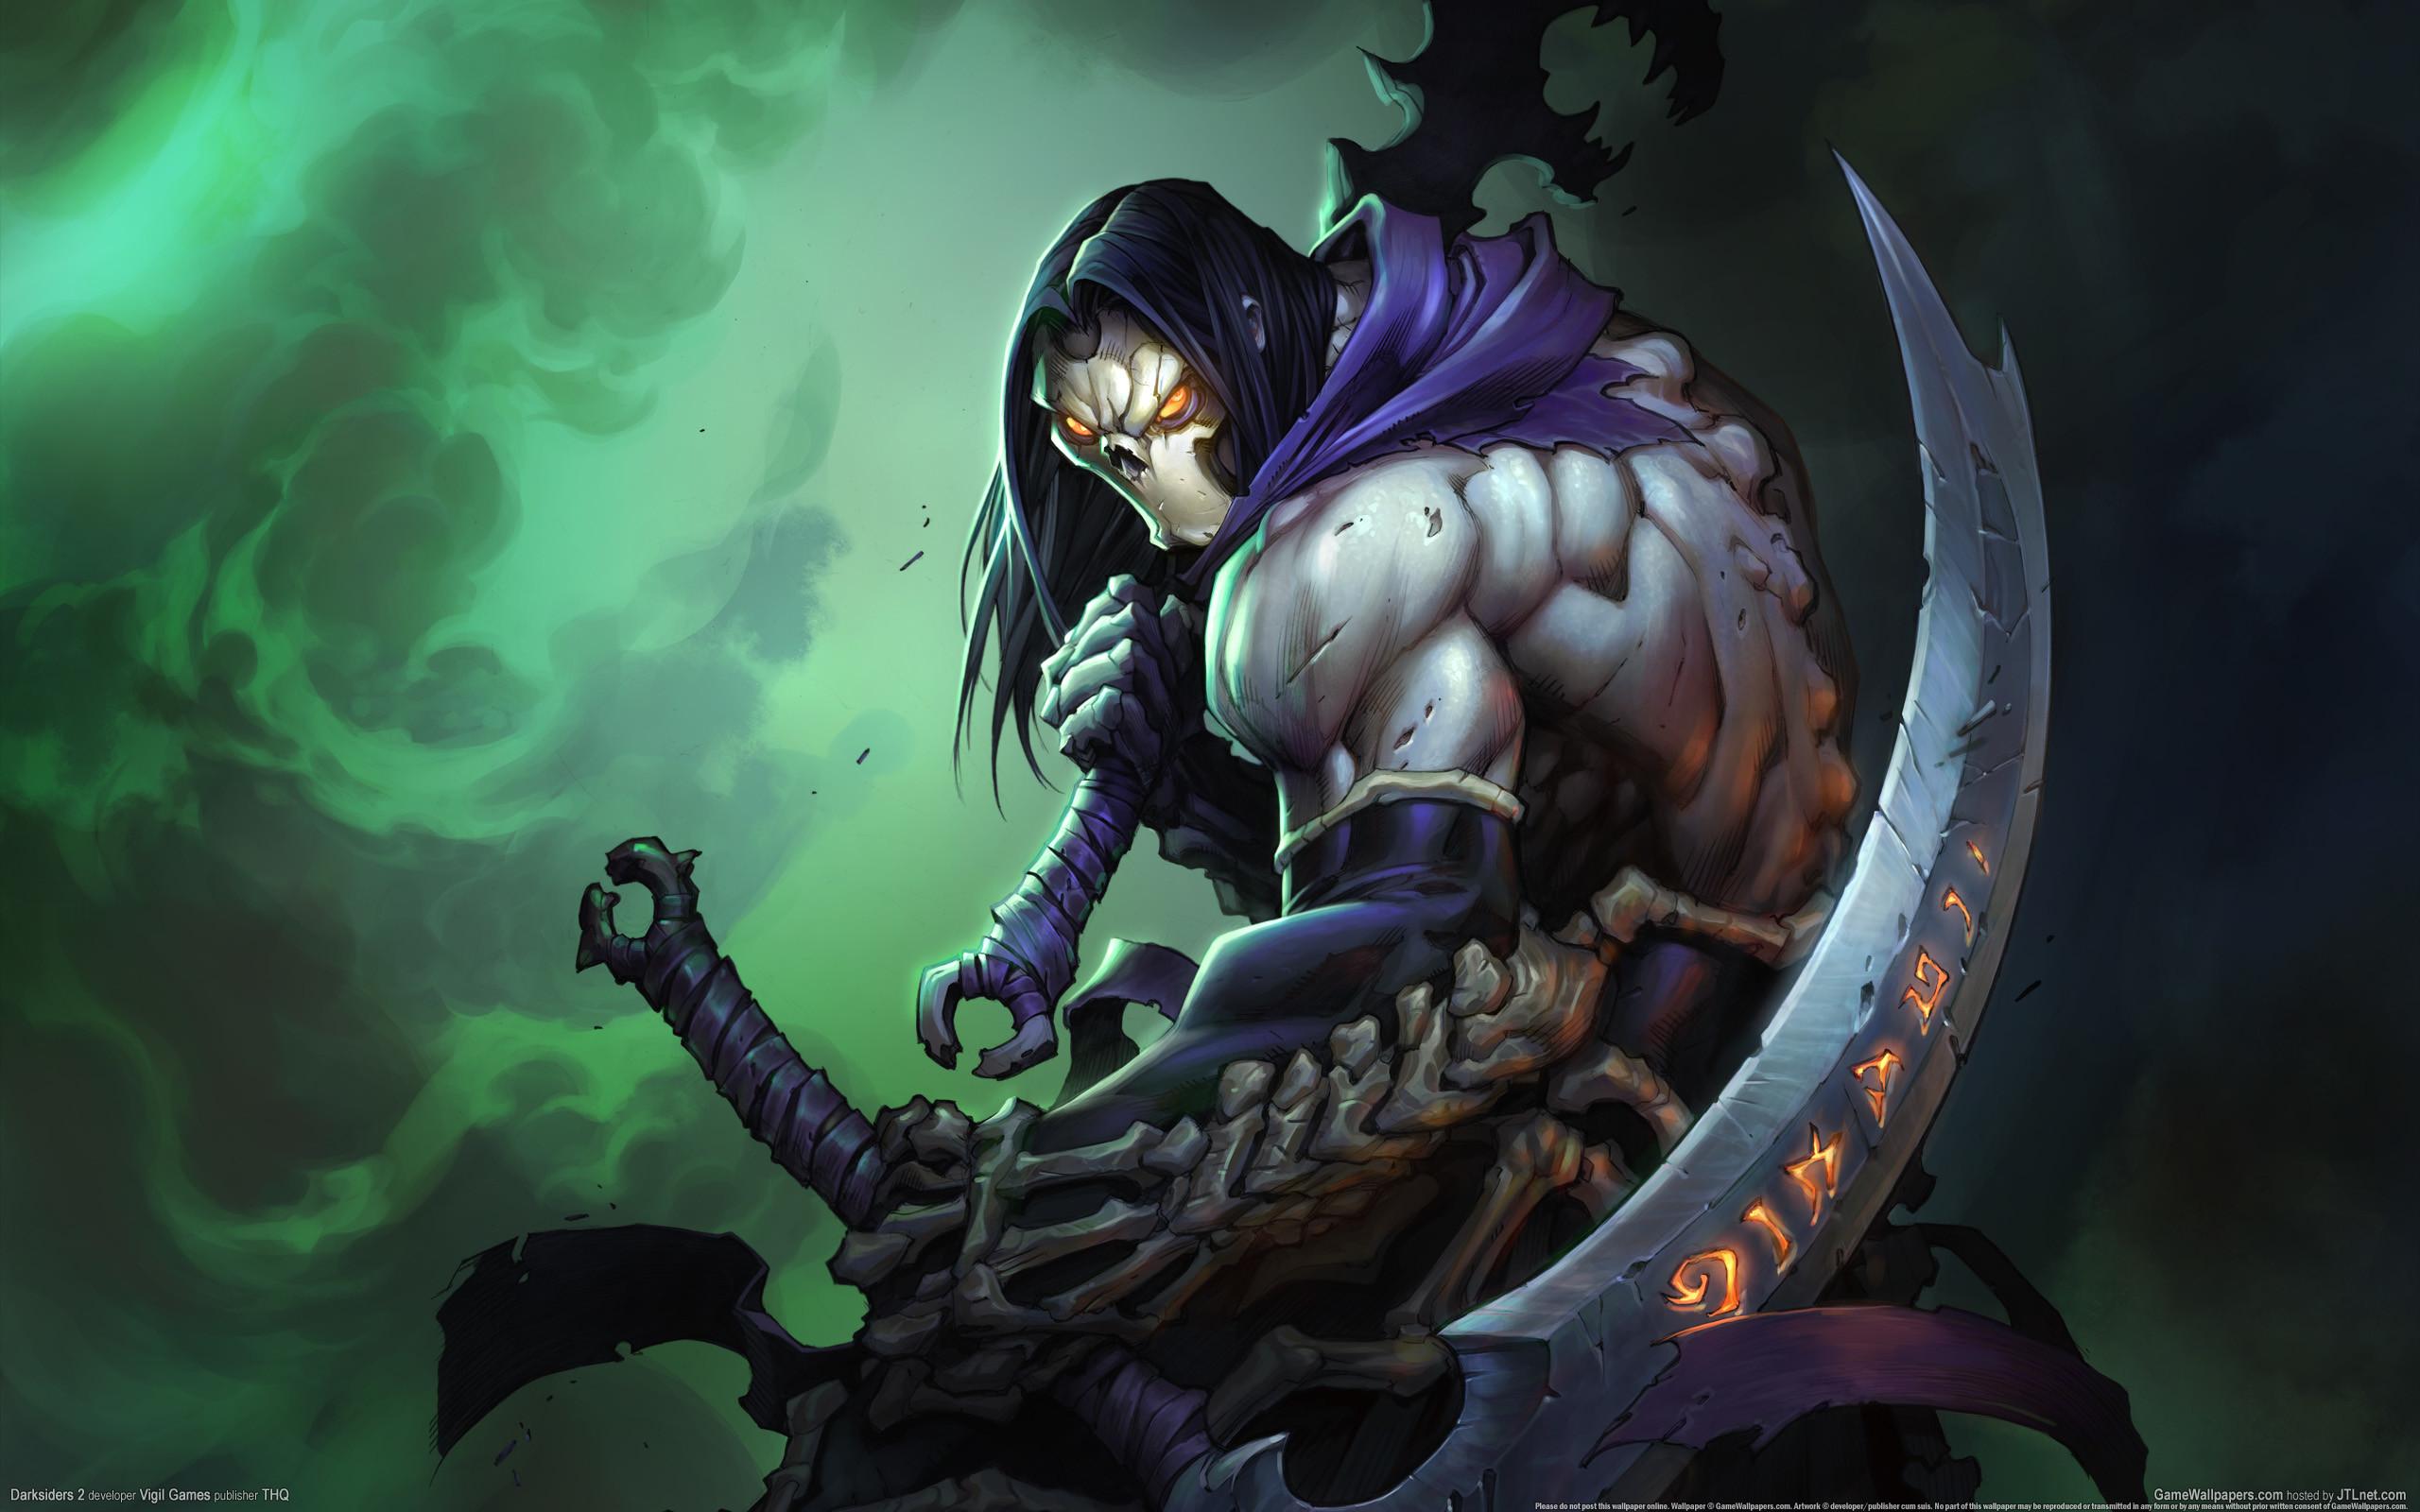 Darksiders II Undead Warriors Scythe Games grim reaper dark fantasy weapon  e wallpaper background